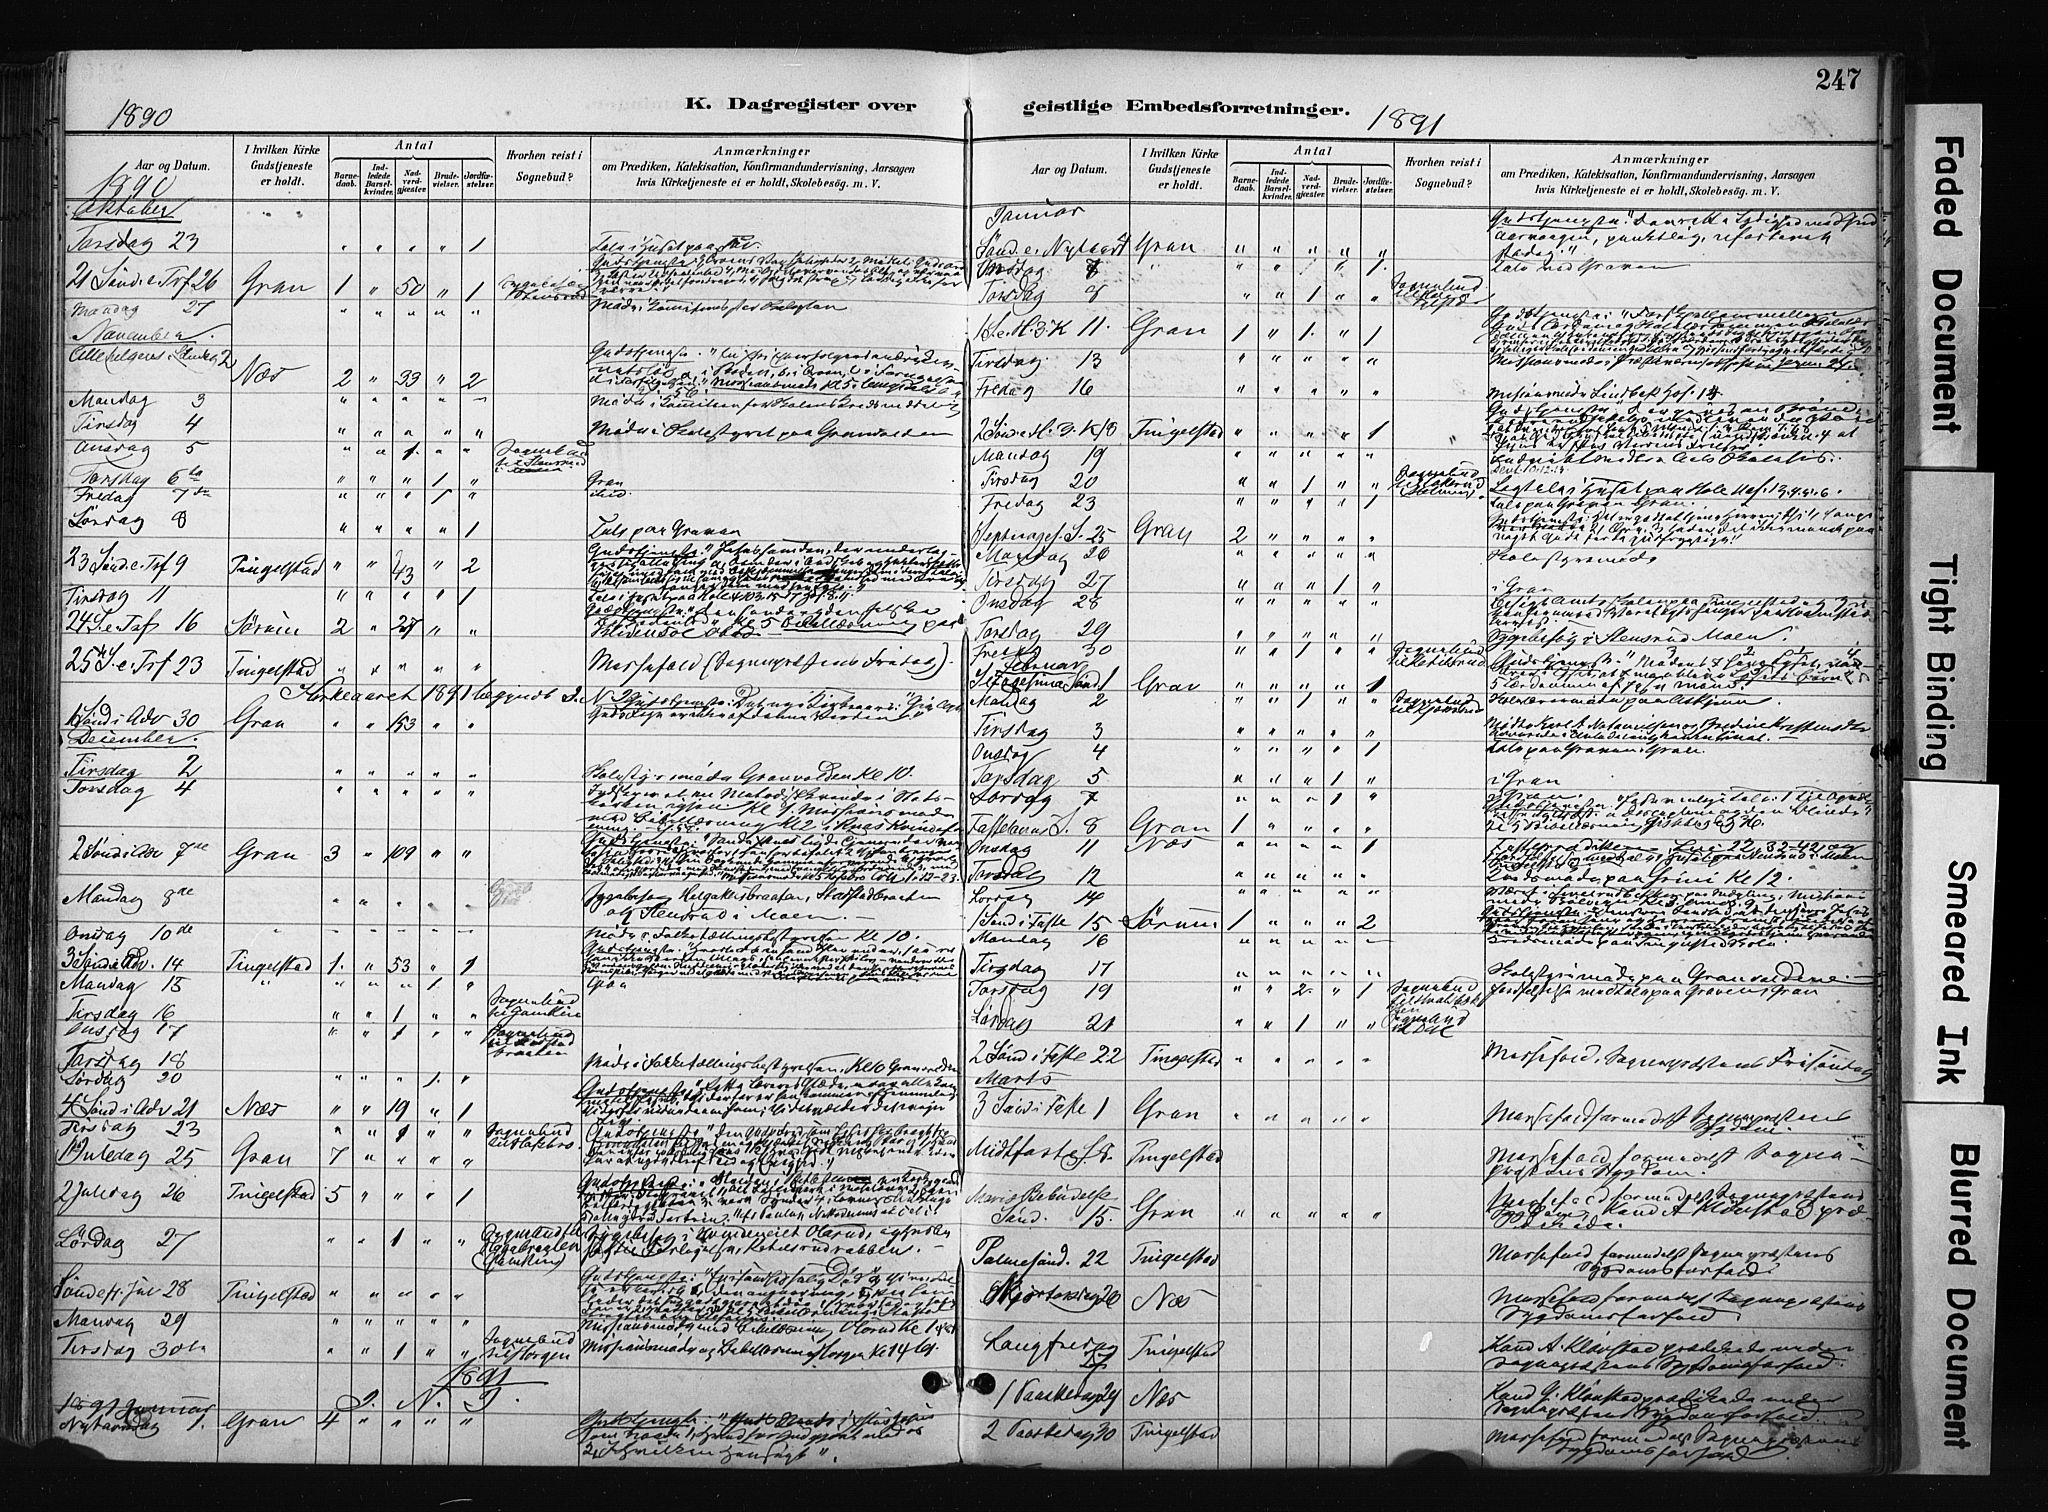 SAH, Gran prestekontor, Ministerialbok nr. 17, 1889-1897, s. 247